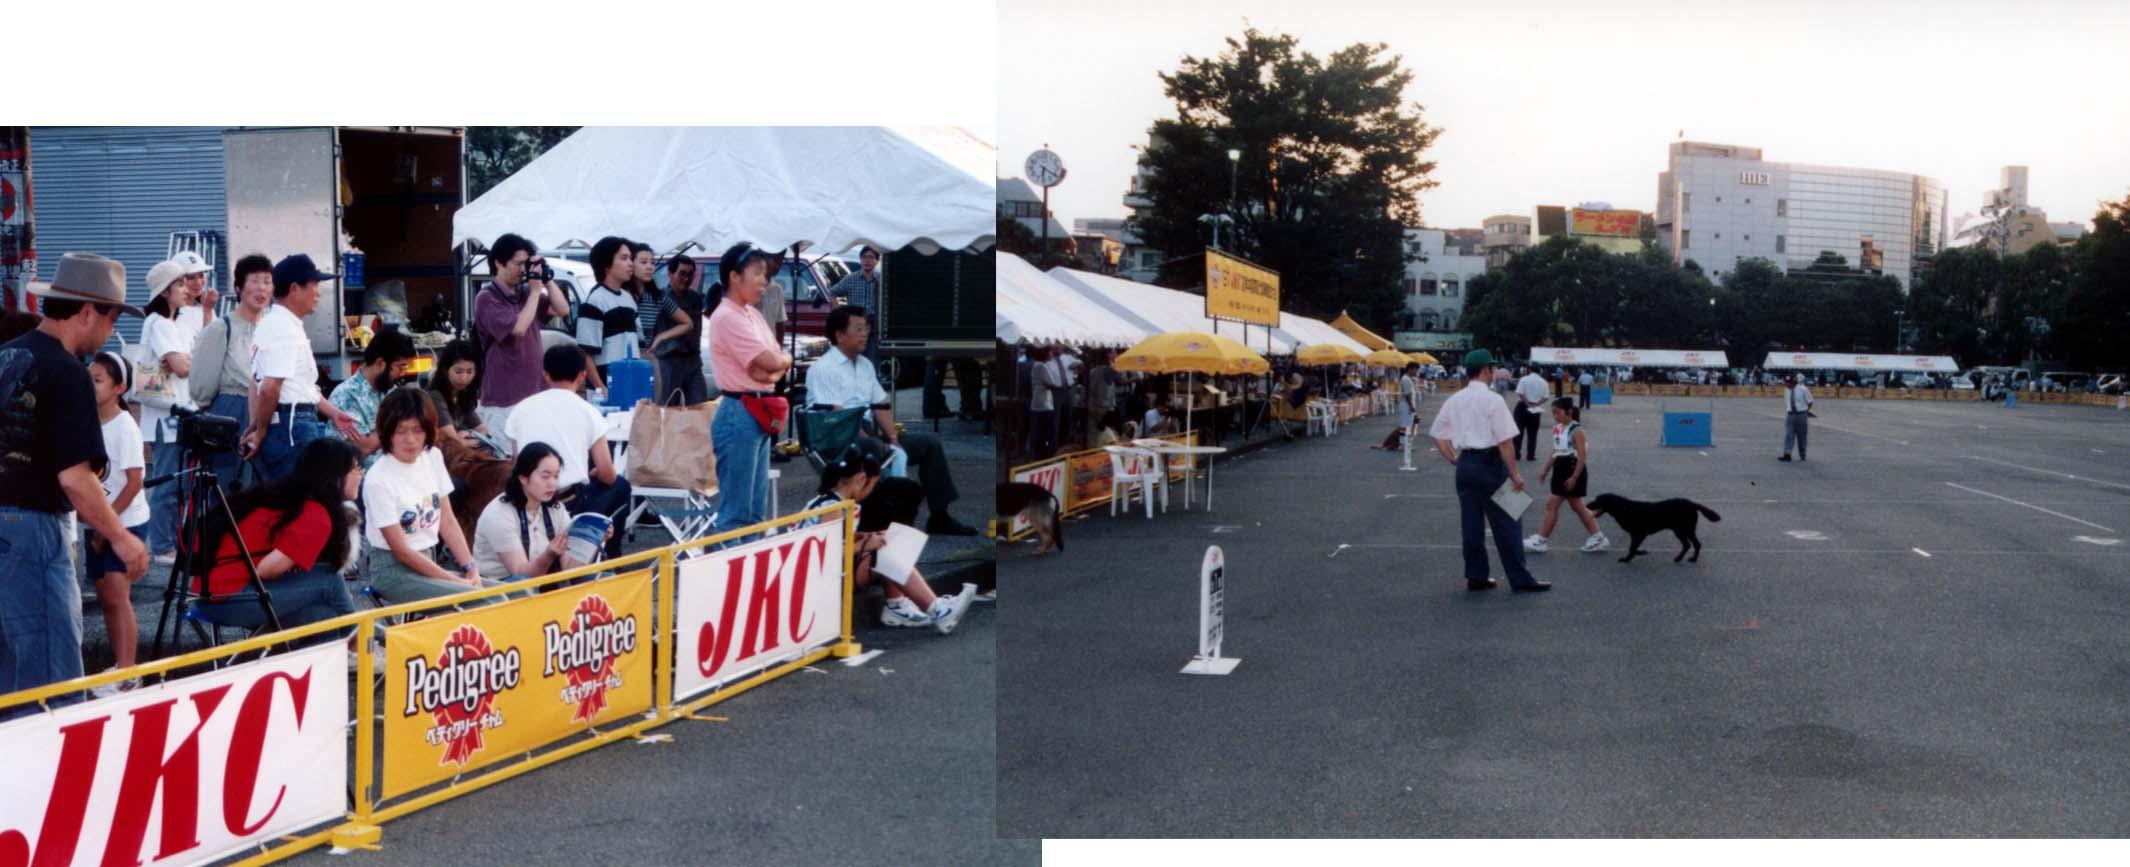 1997年JKC夏季本部競技会の一場面①